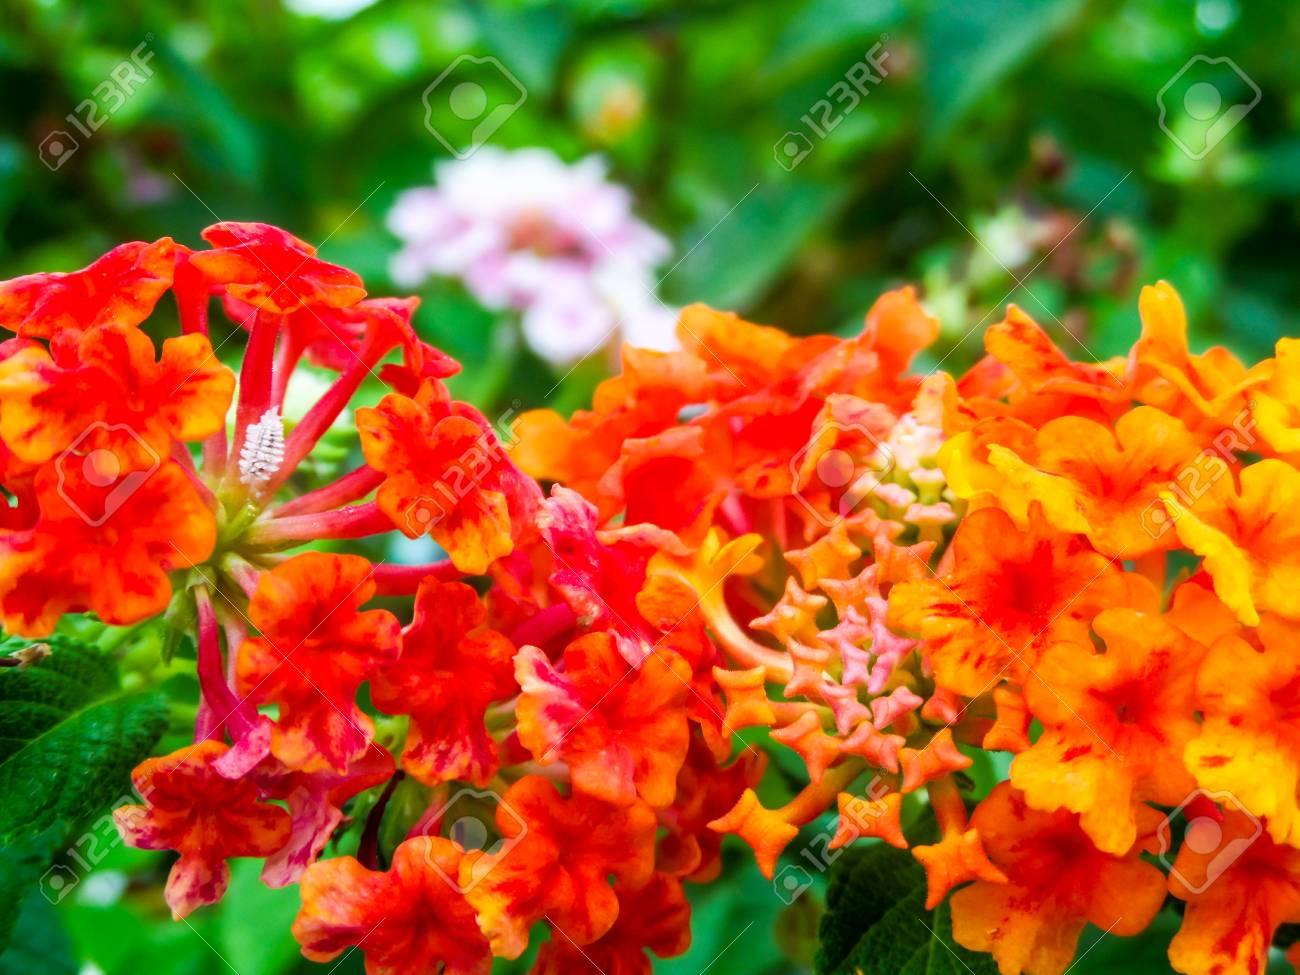 Lantana Red Orange Yellow Colorful Tone Beauty Flower In Garden